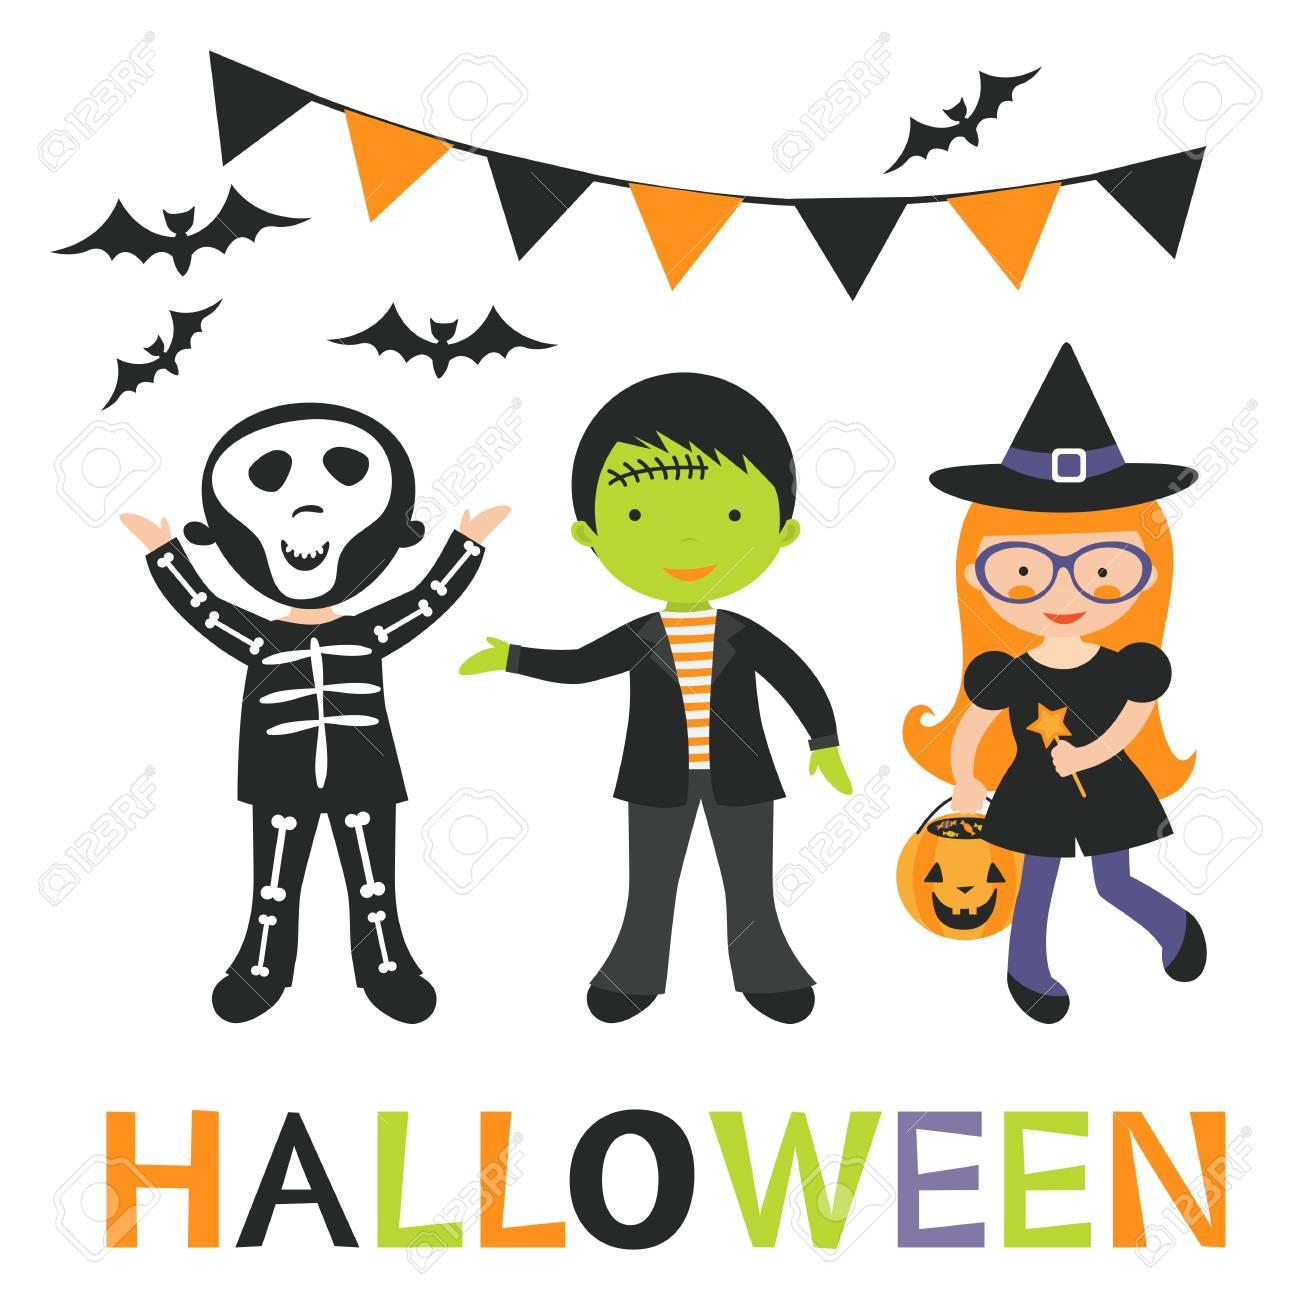 Illustration of cute Halloween kids in vector format - 64188502